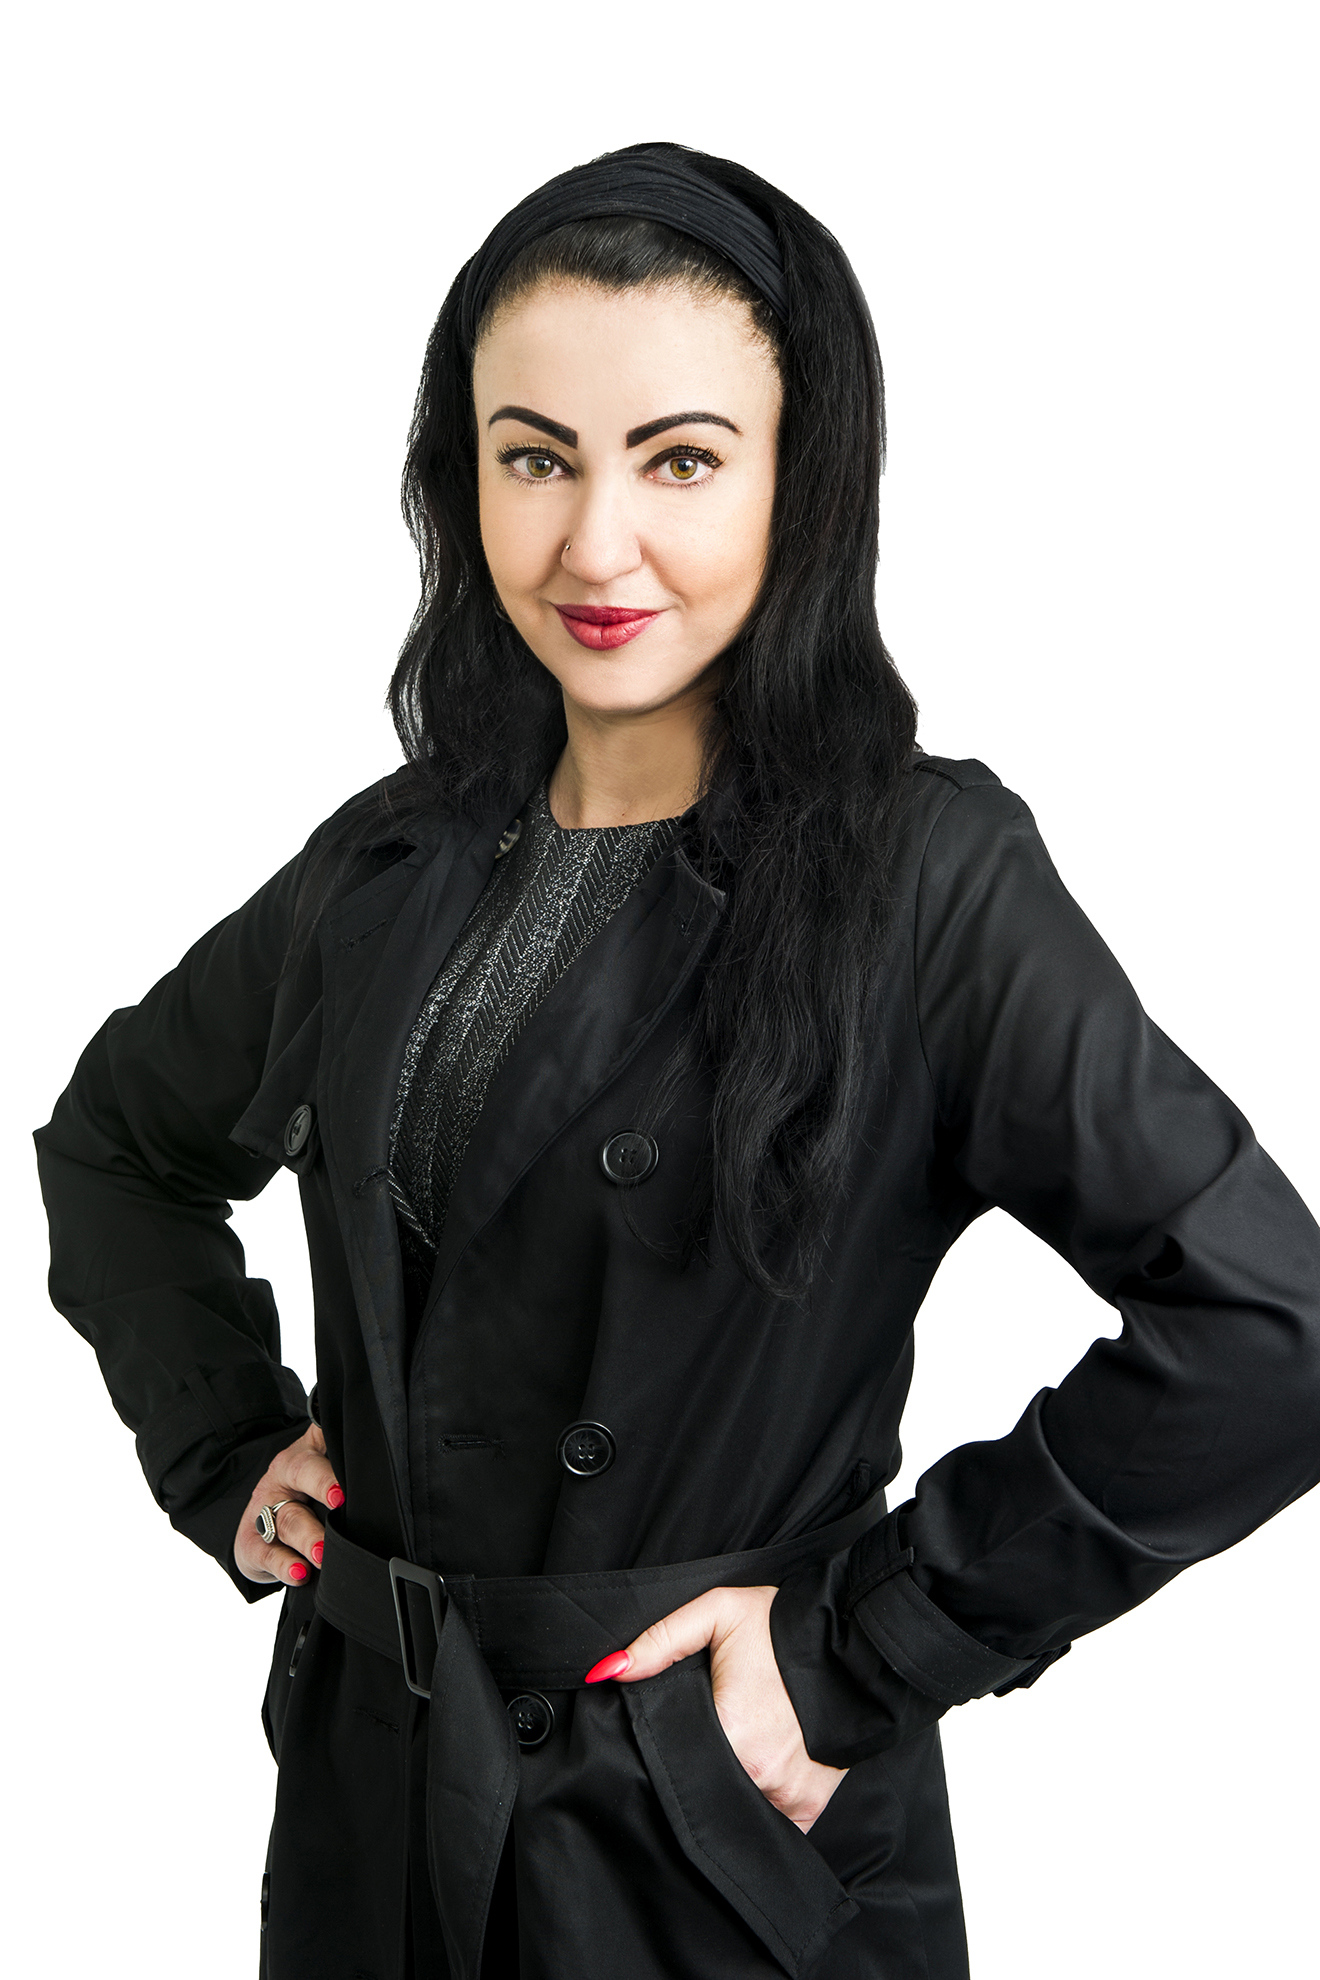 Donna Gudalovic